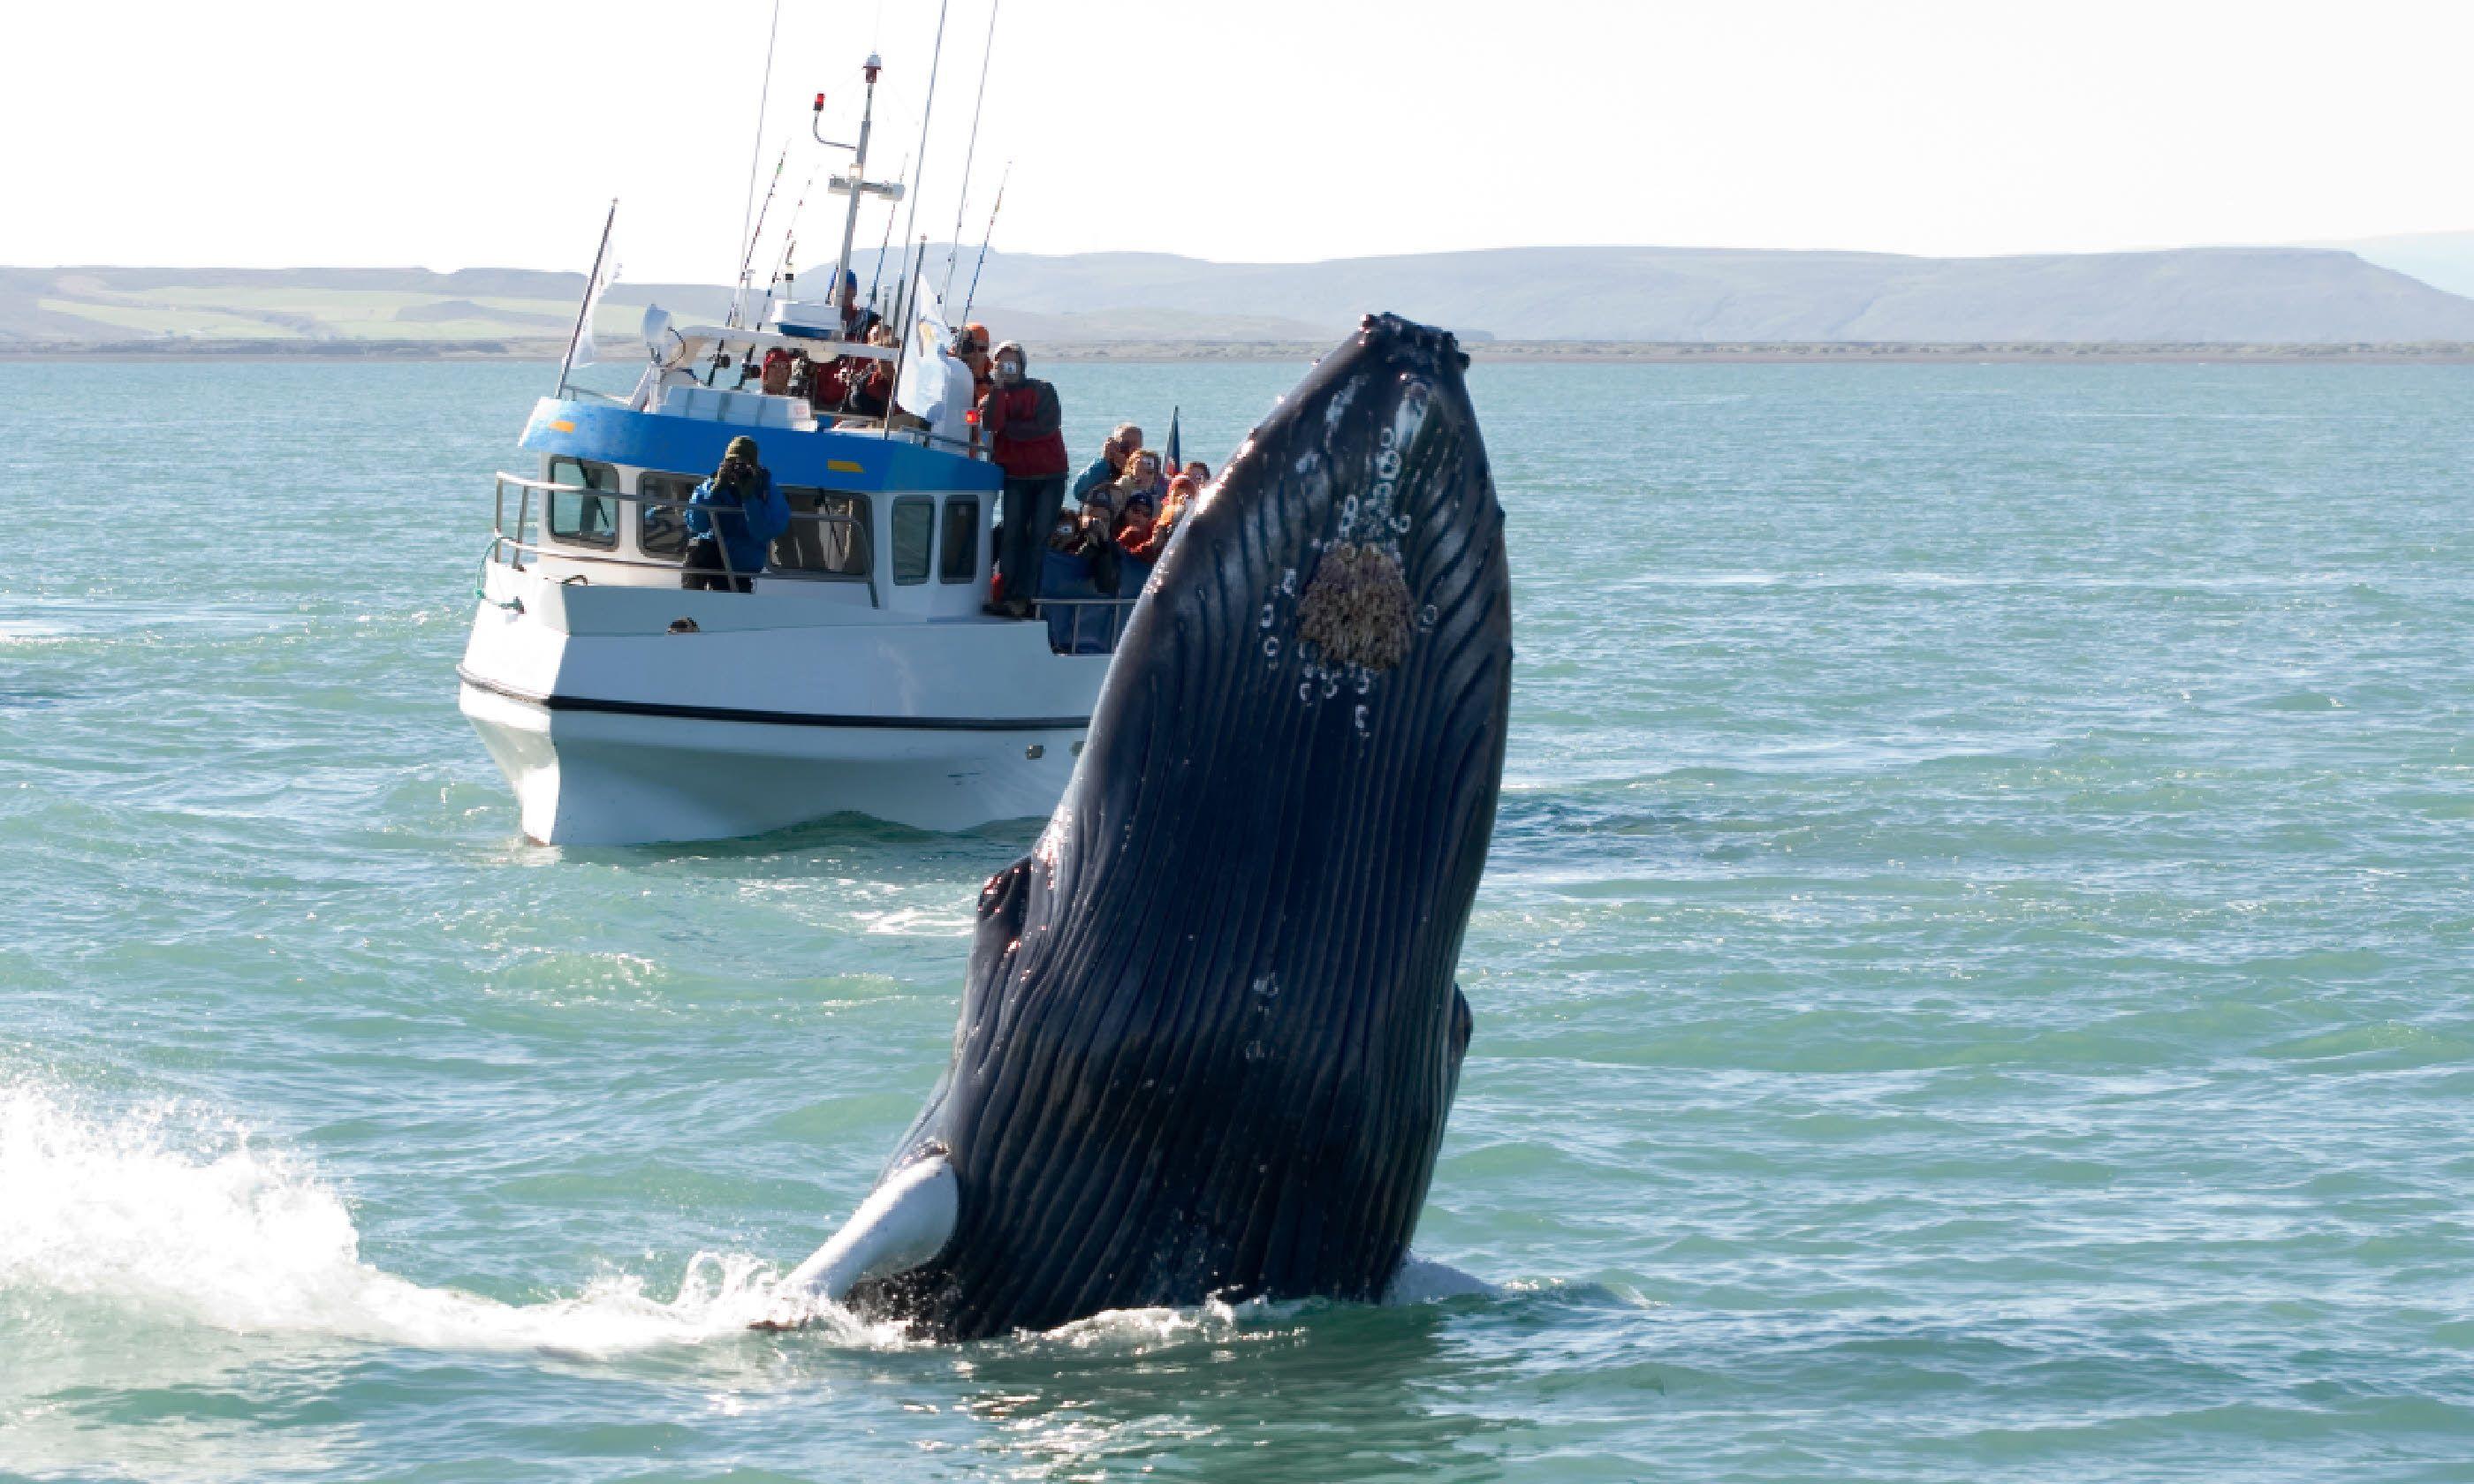 Whale near Husavik, Iceland (Shutterstock)